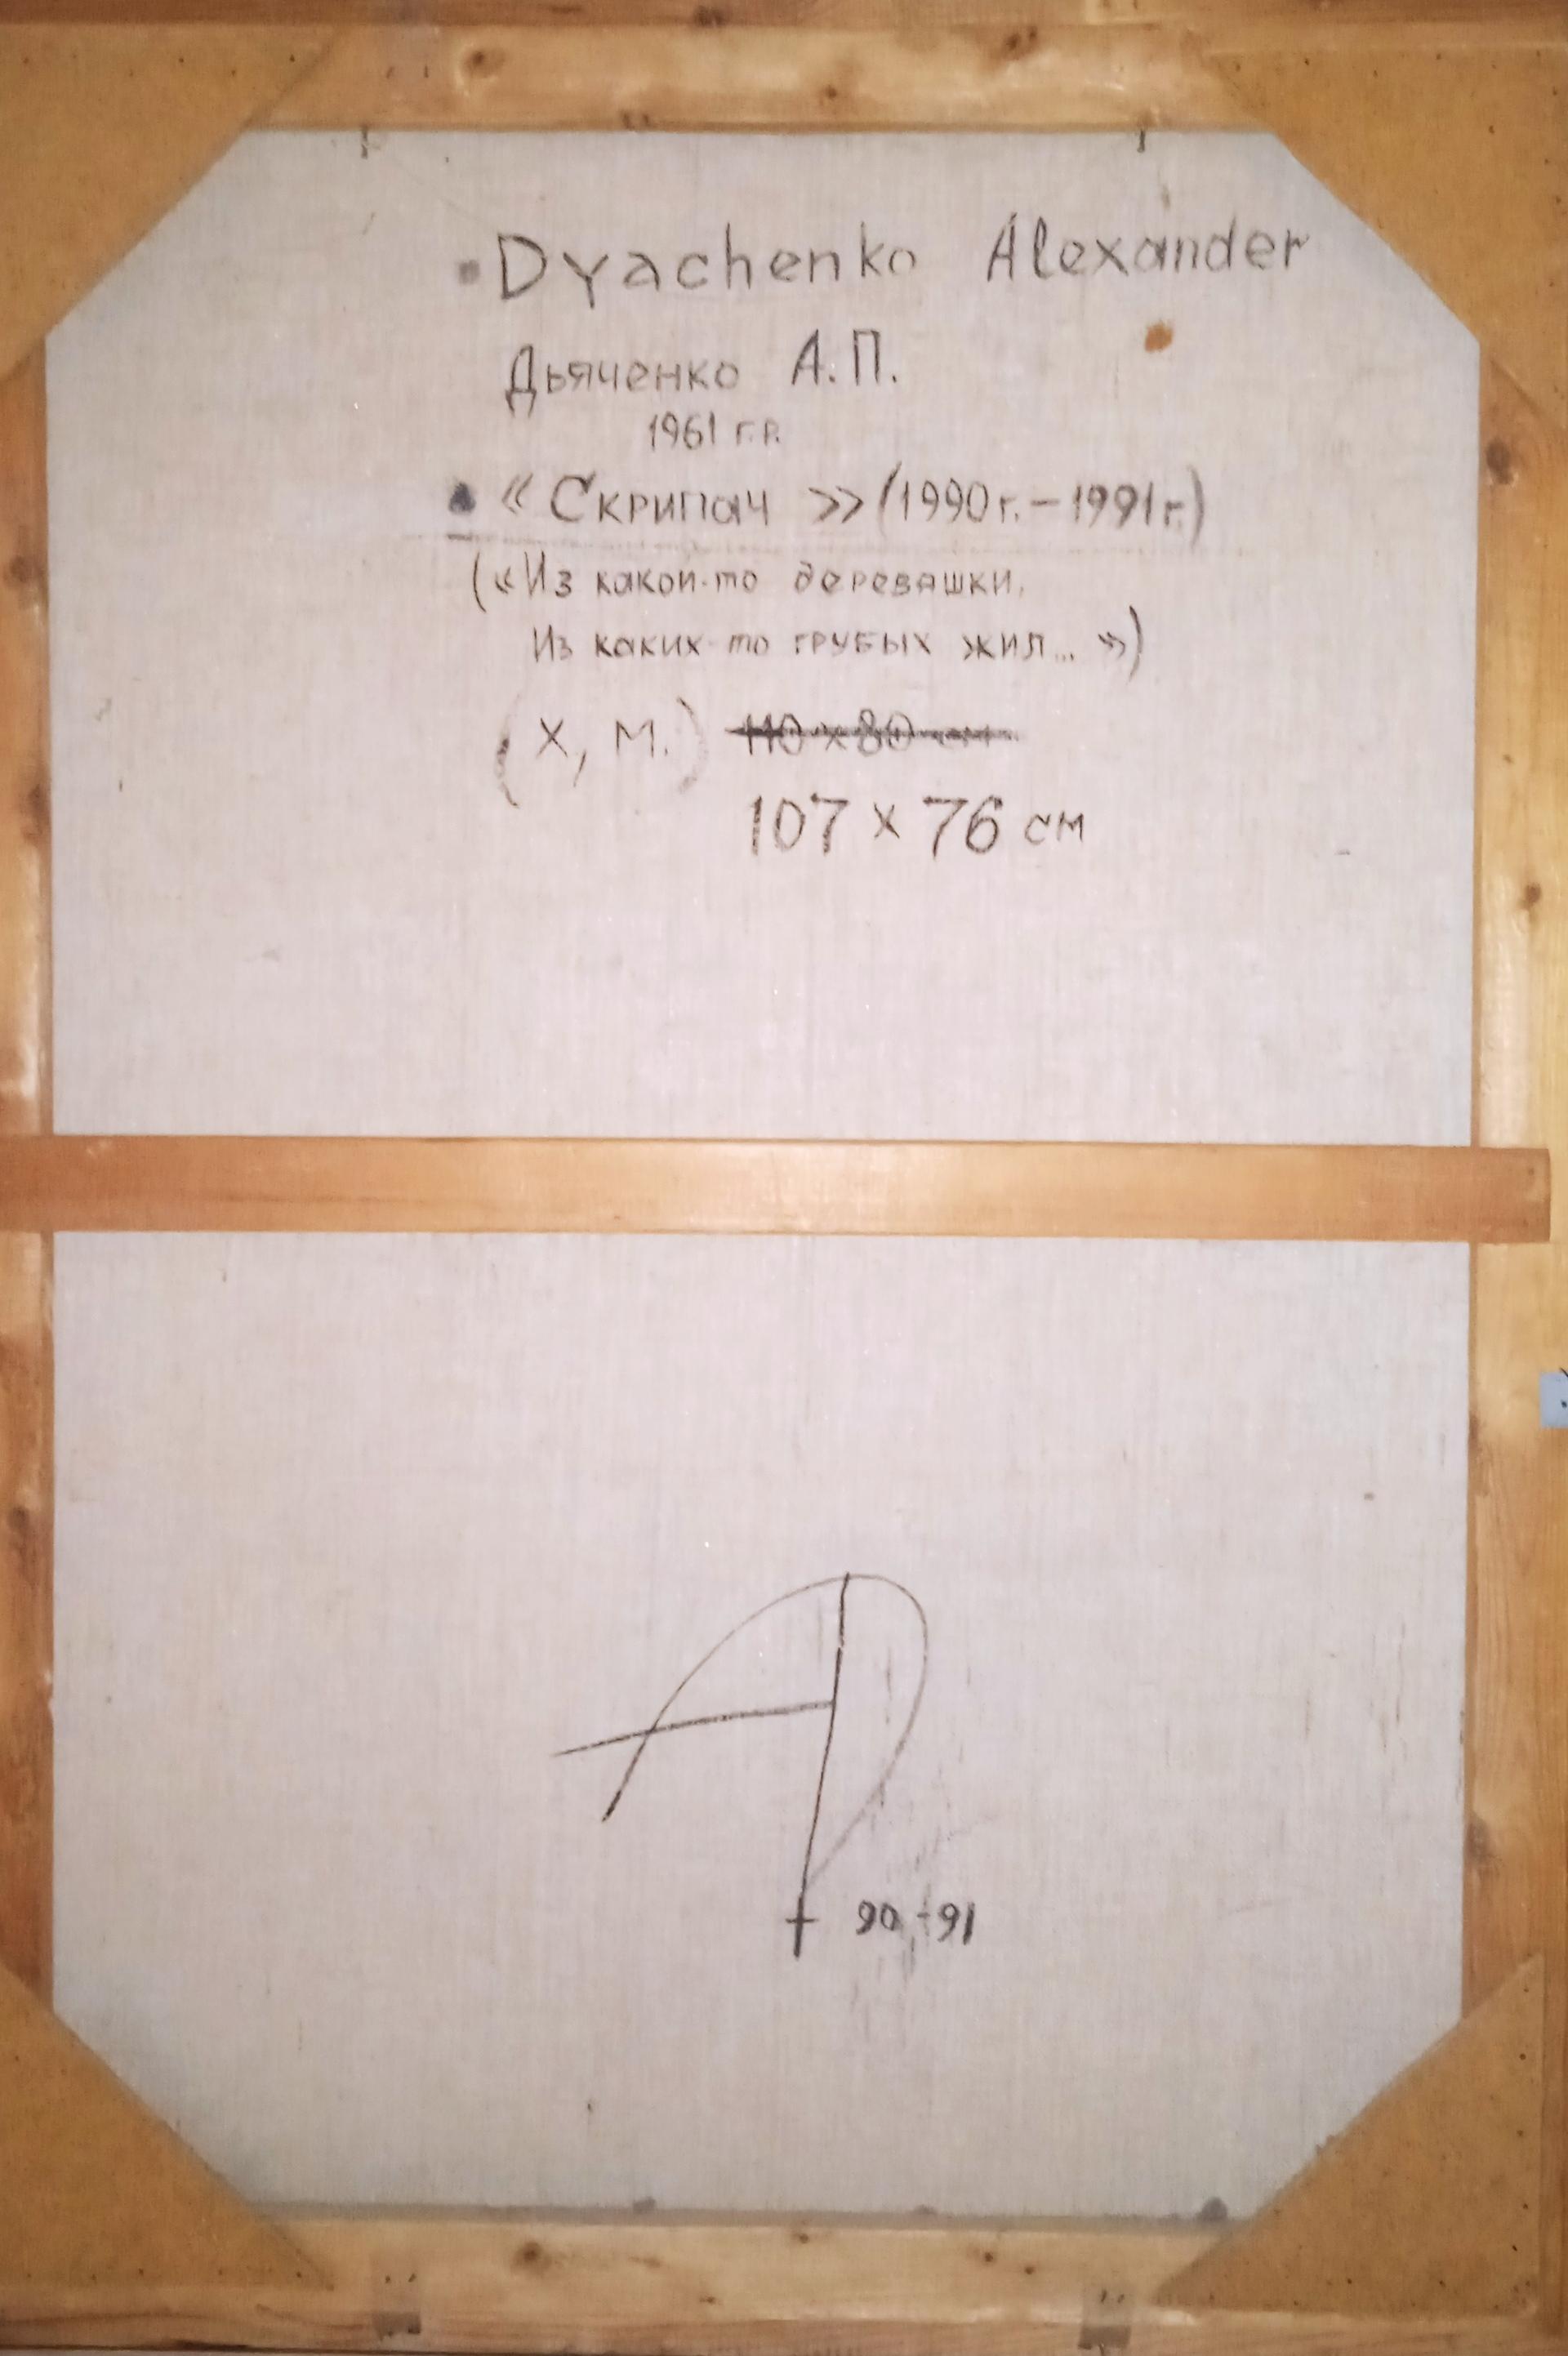 Скрипач 107-76 см., холст, масло 1990-1991 год  - 2